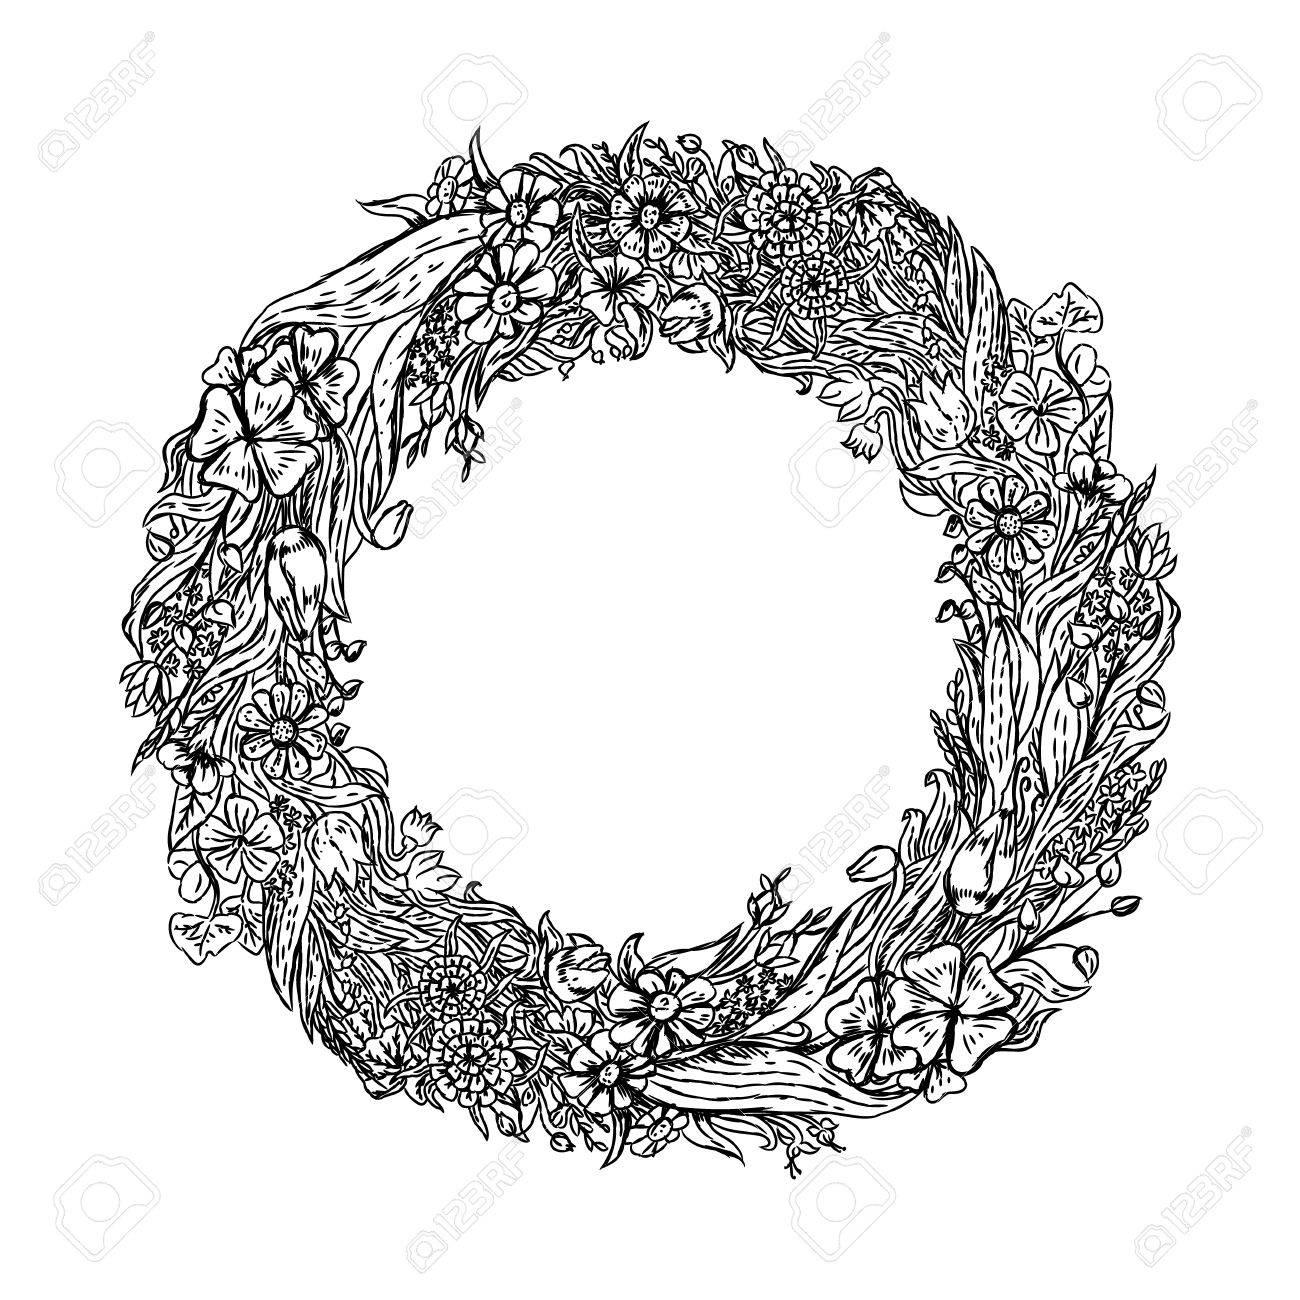 1300x1300 Hand Drawn Wreath Of Flowers. Background With Wild Flowers. Retro